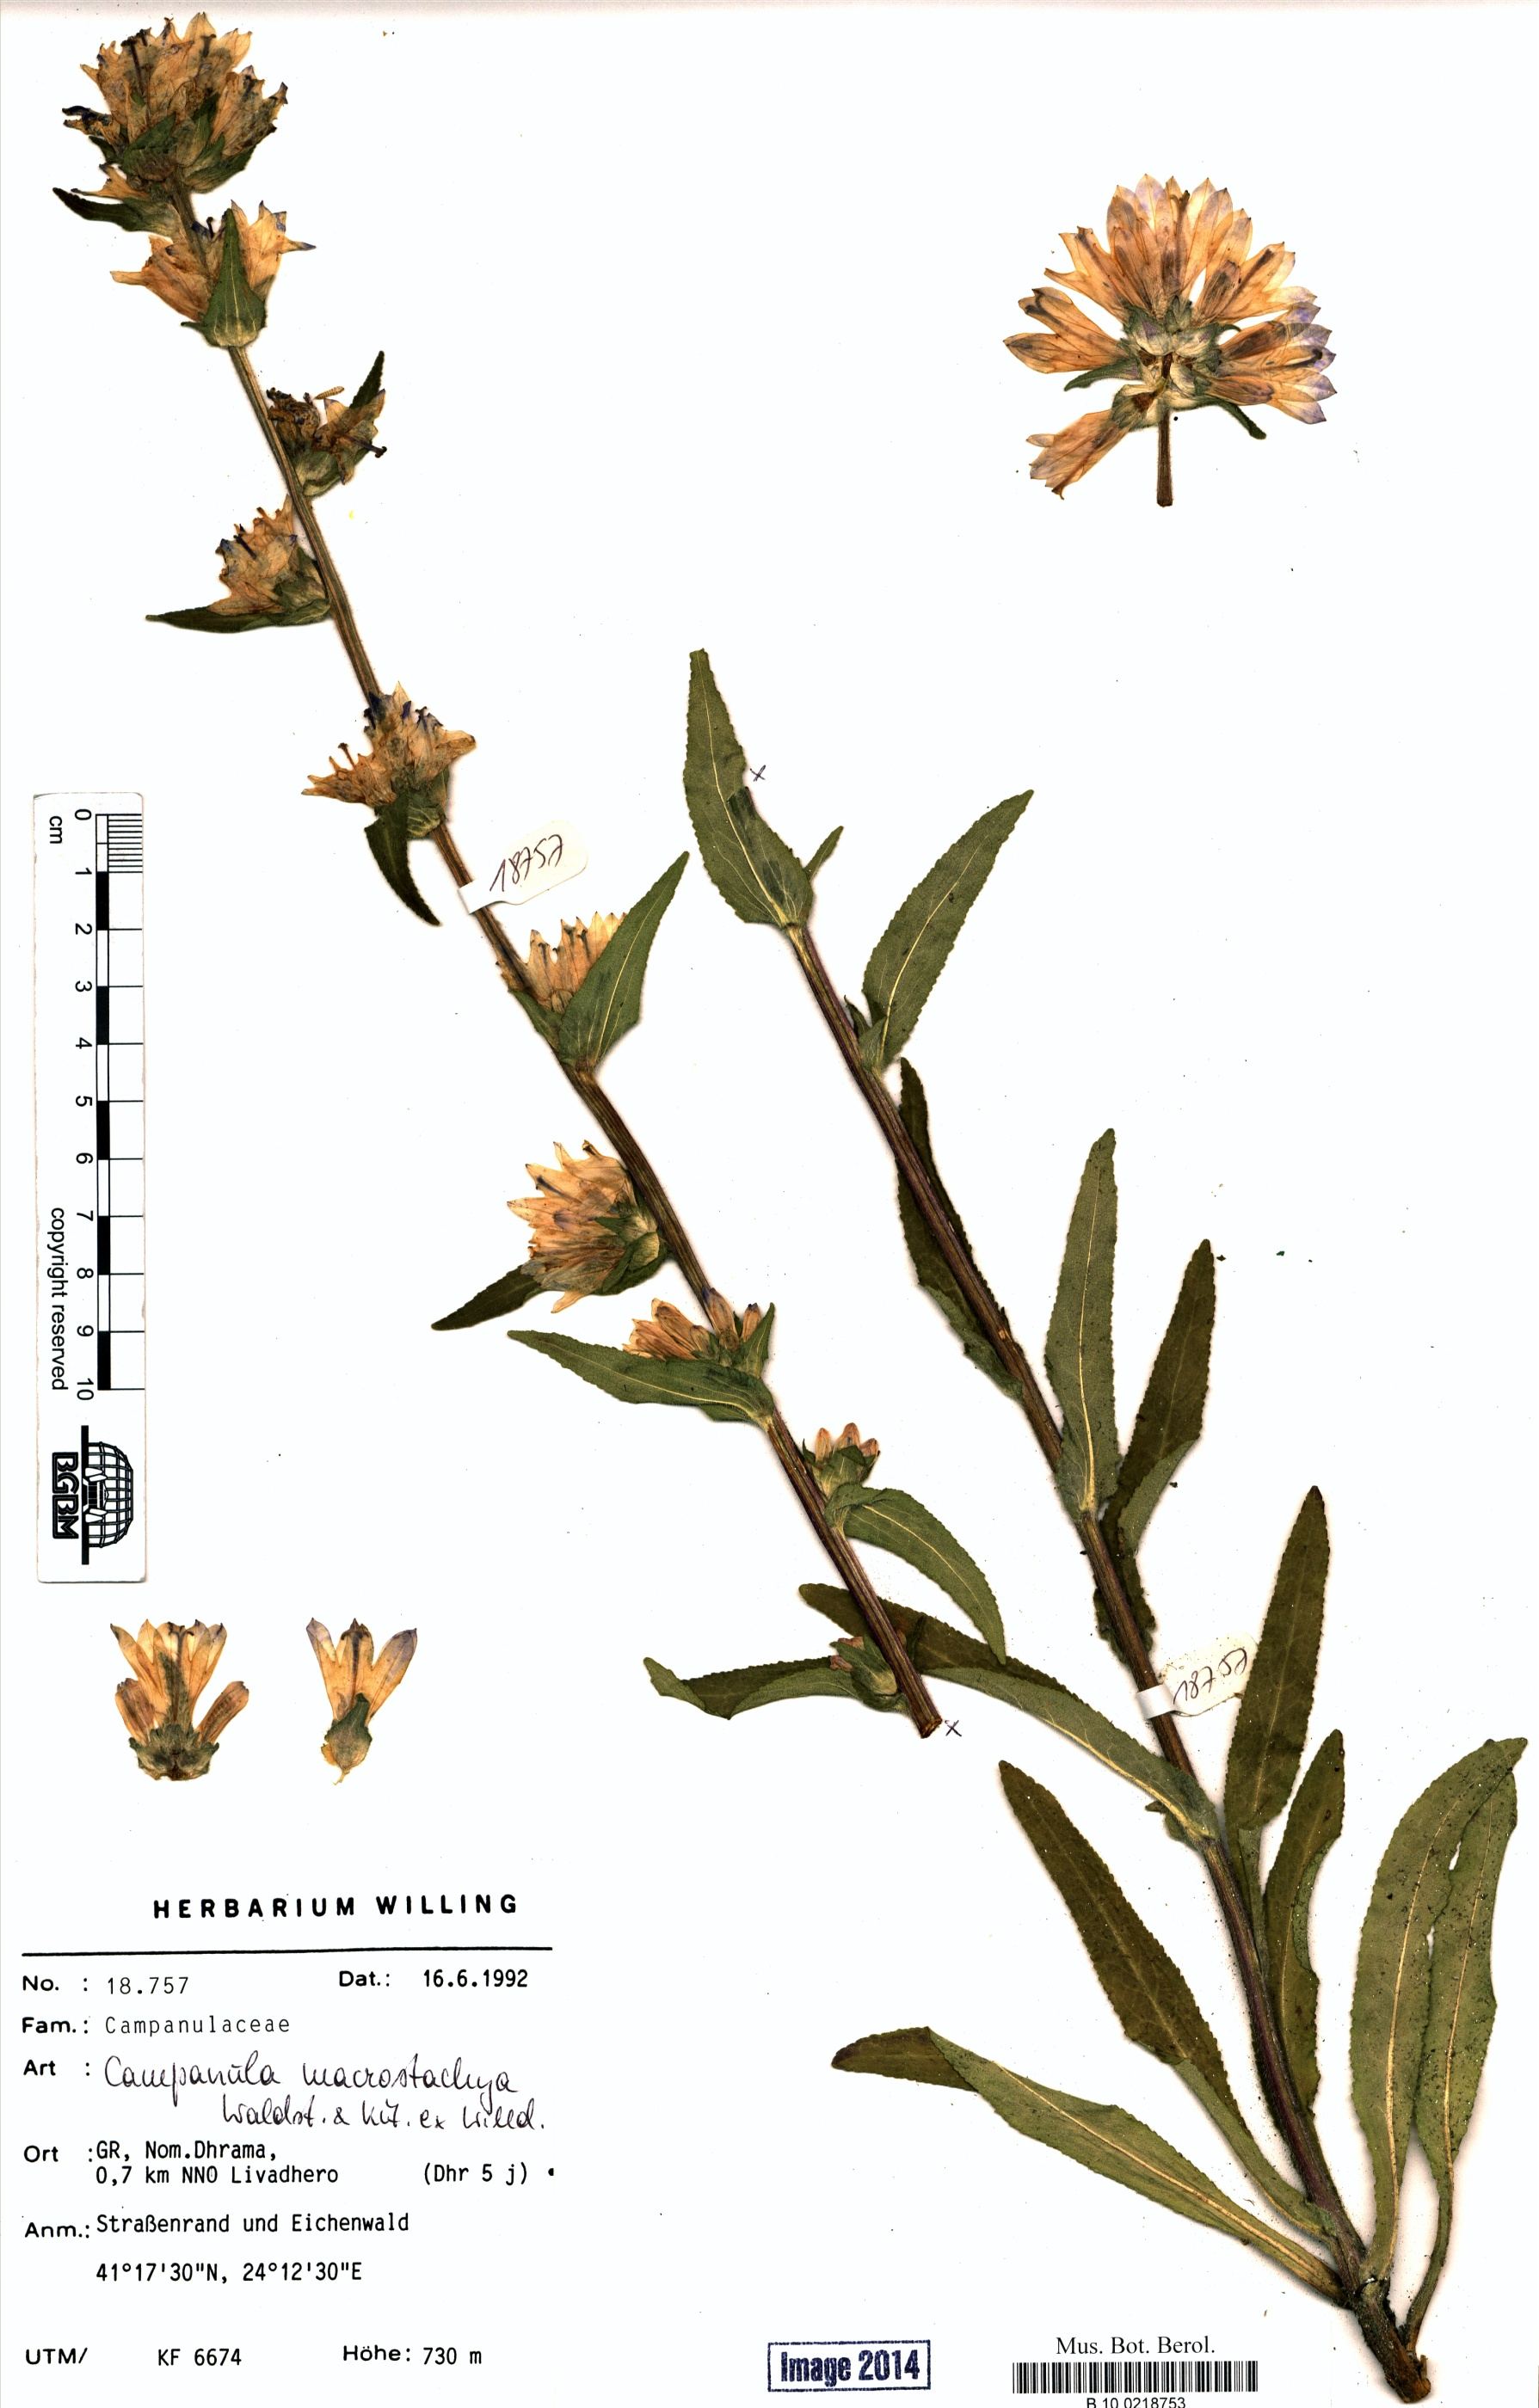 http://ww2.bgbm.org/herbarium/images/B/10/02/18/75/B_10_0218753.jpg